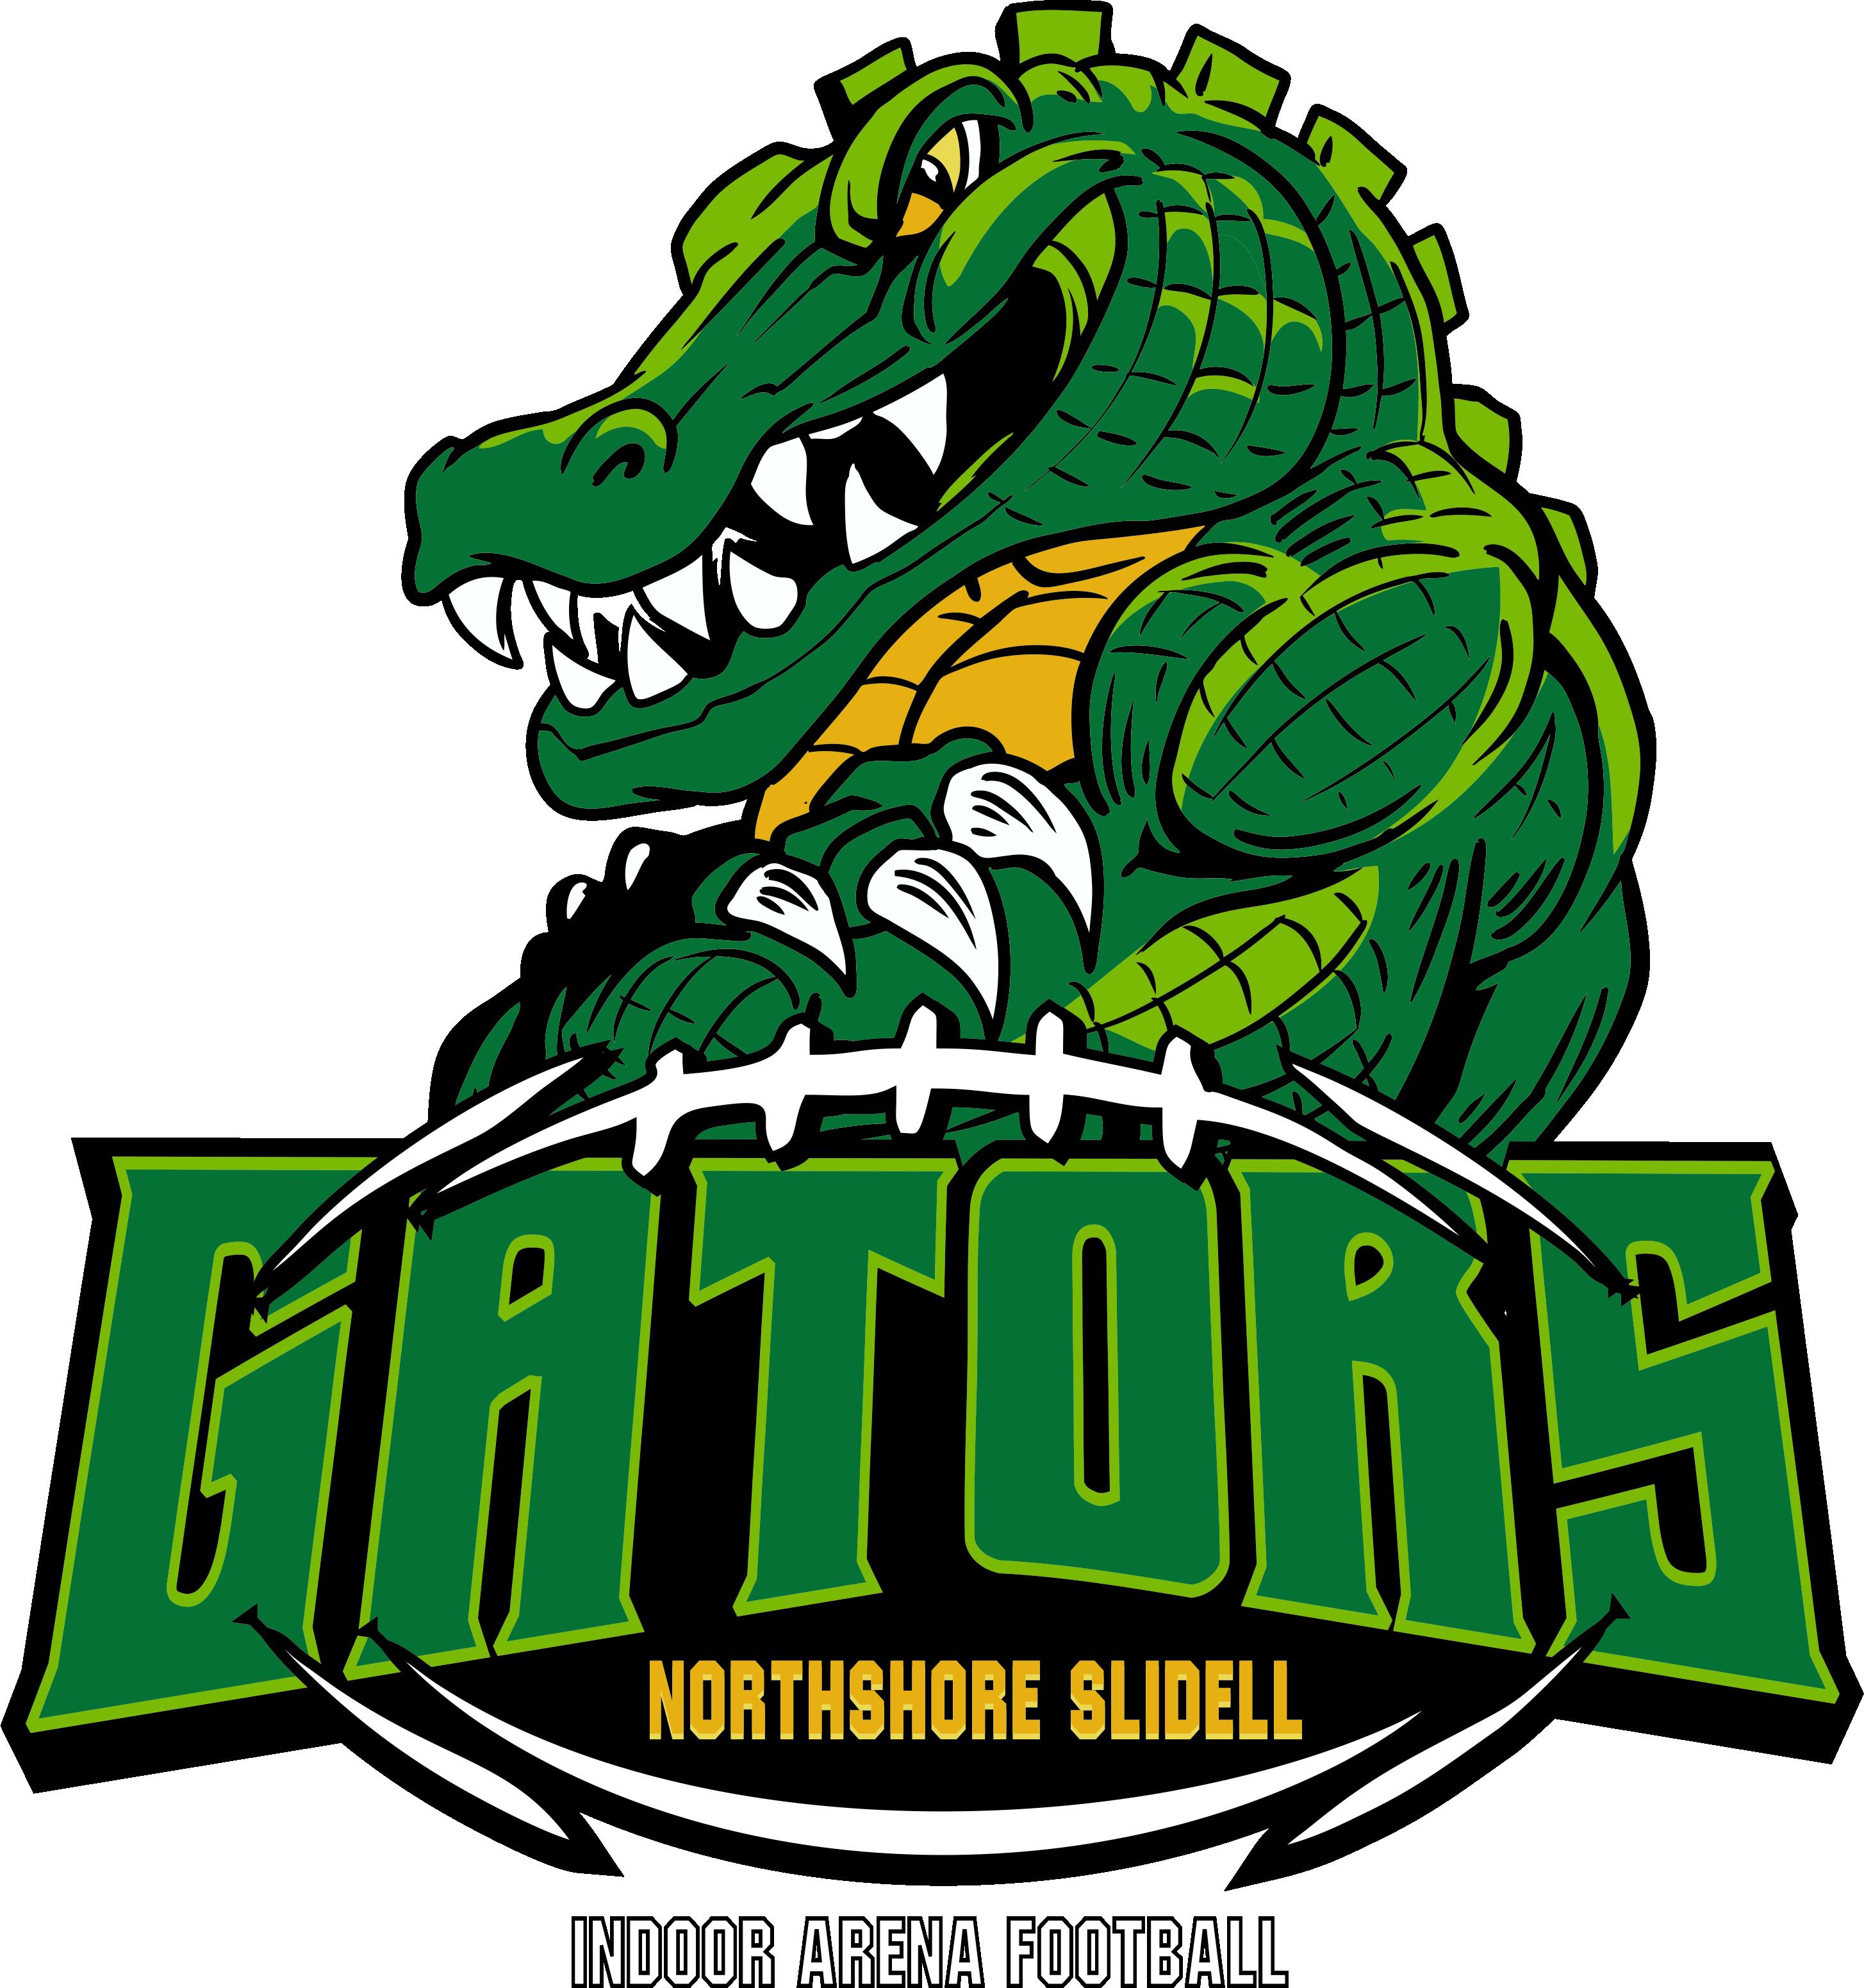 Northshore gators logo december. Gator clipart american alligator